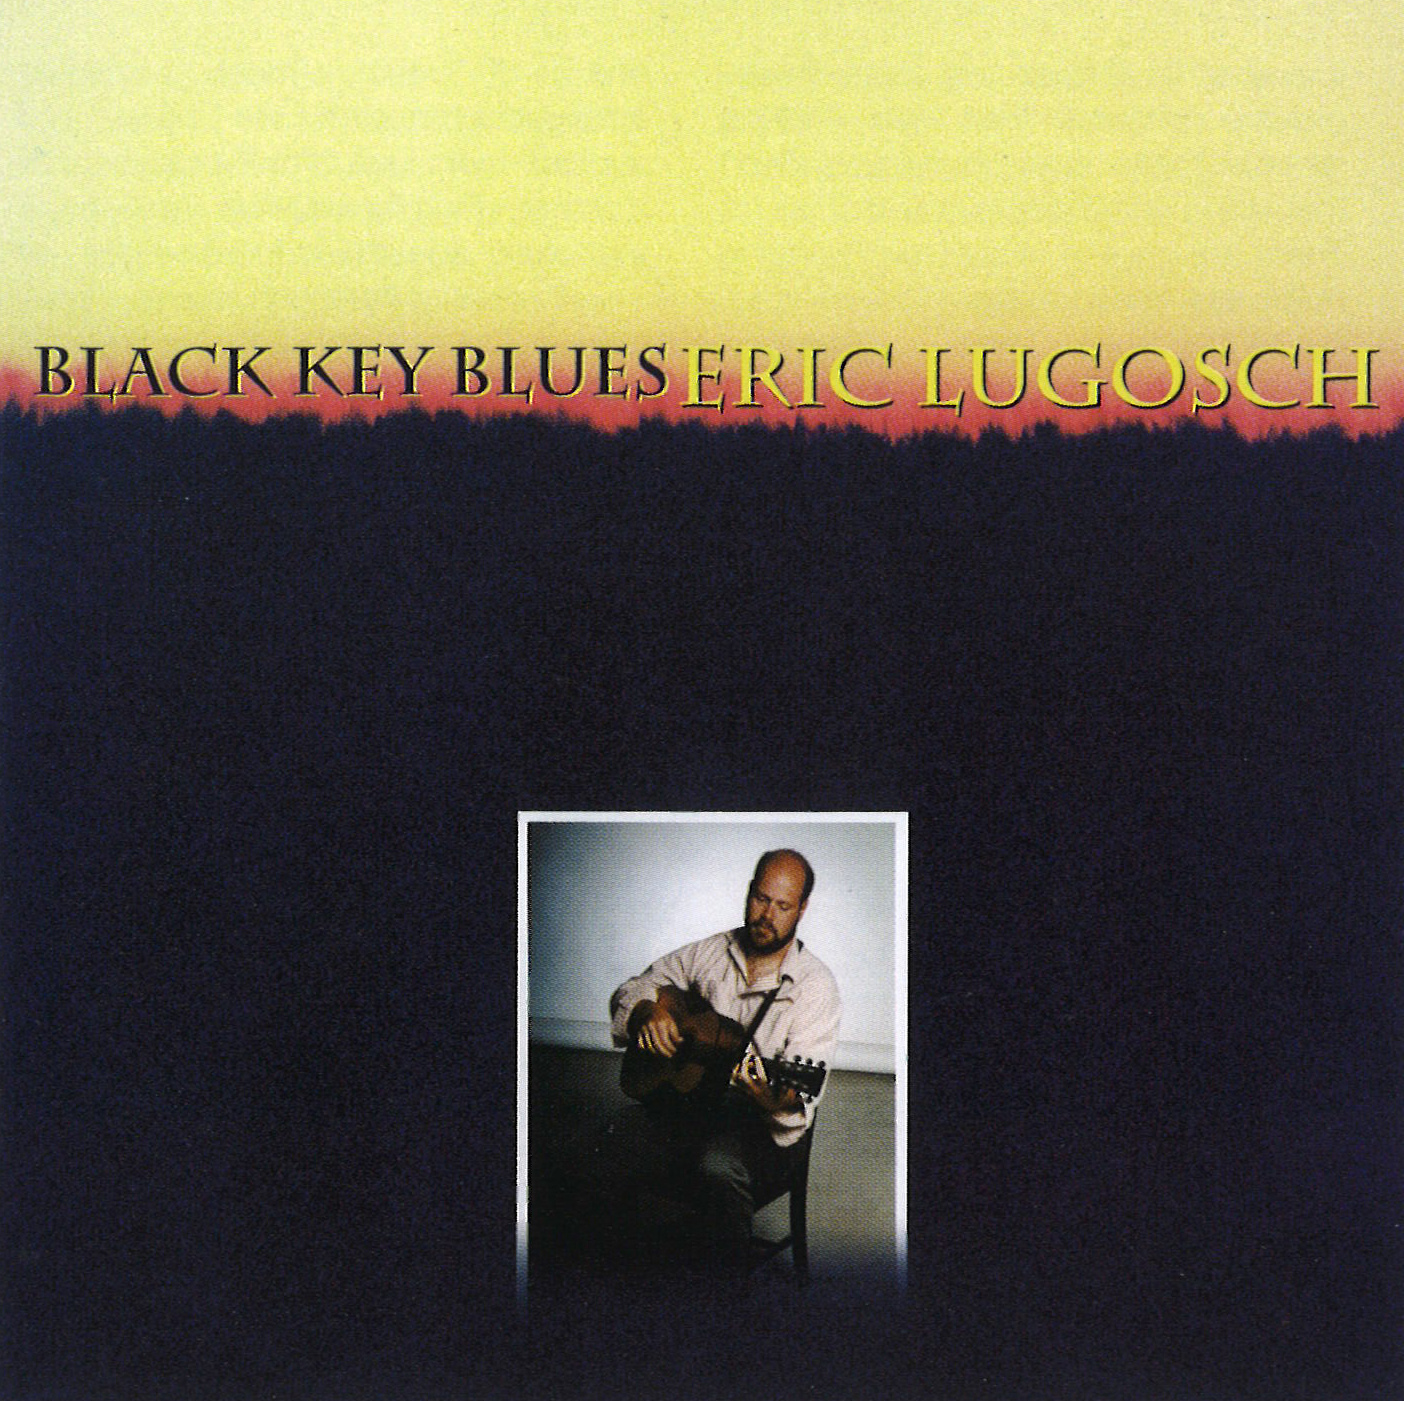 Black Key Blues.jpg